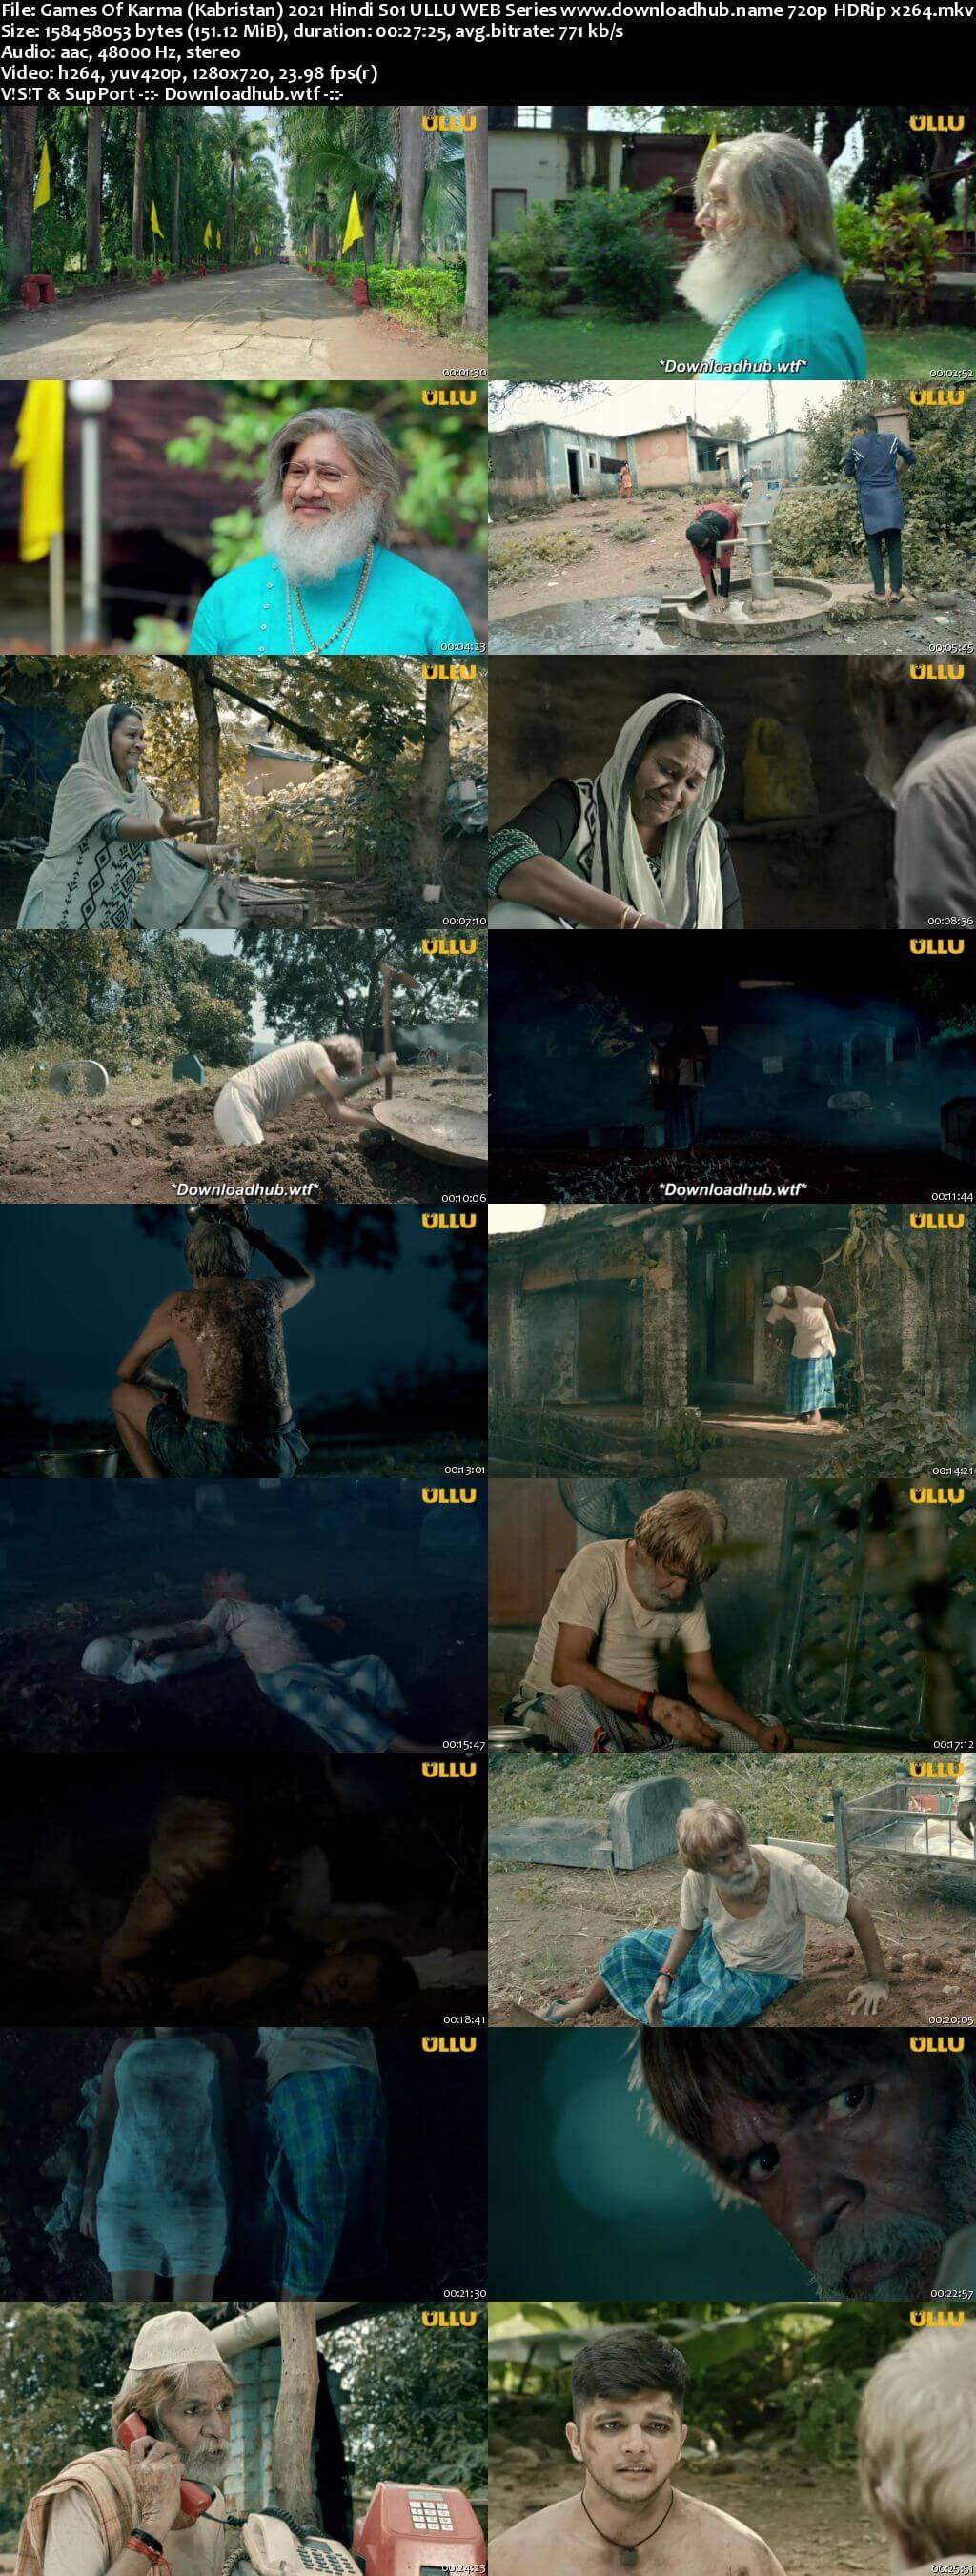 Games Of Karma (Kabristan) 2021 Hindi S01 ULLU WEB Series 720p HDRip x264